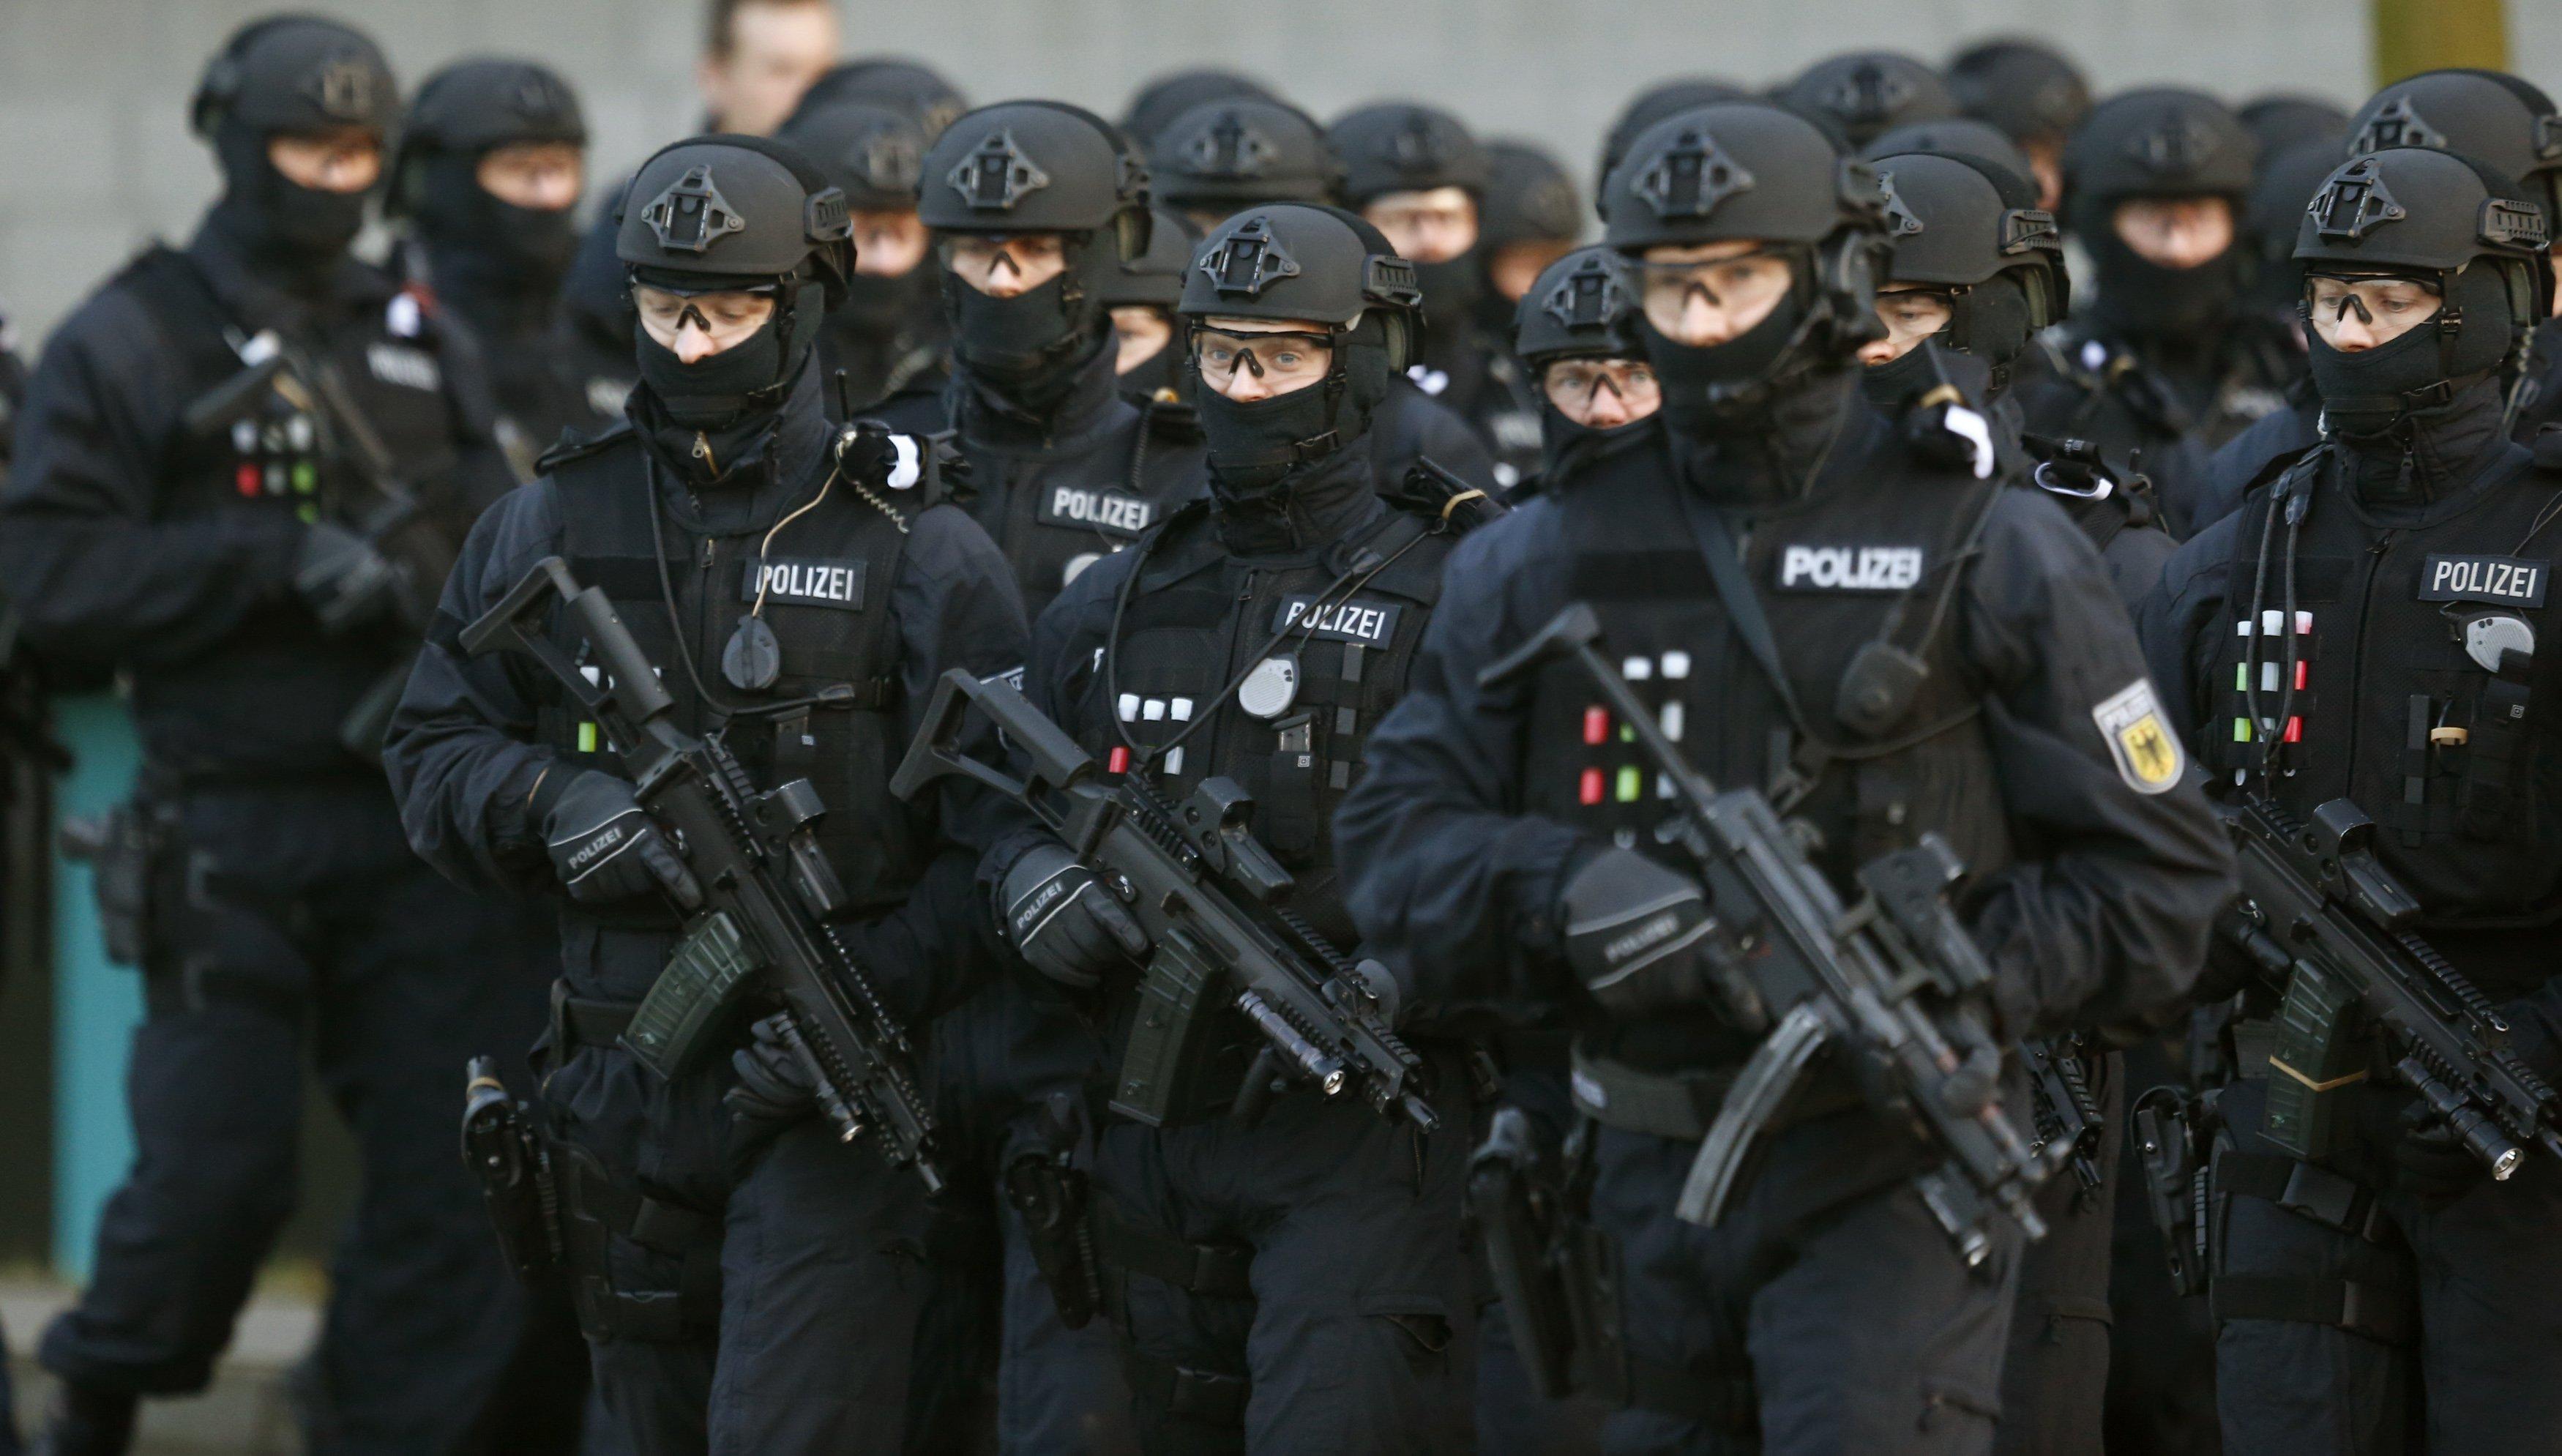 policia alemanya reuters